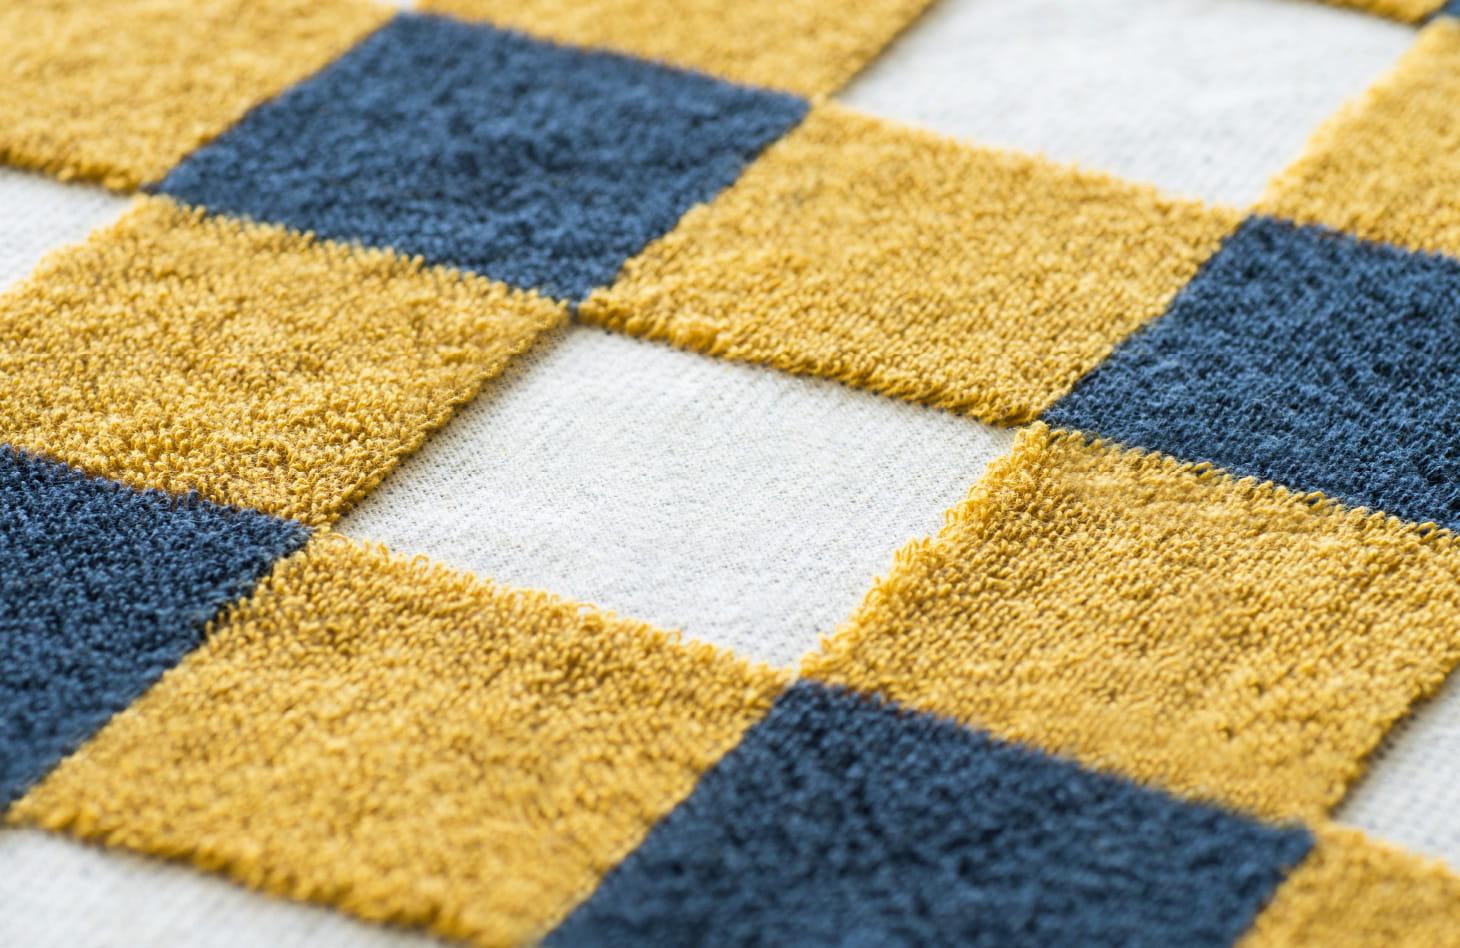 Removing the upper yarn